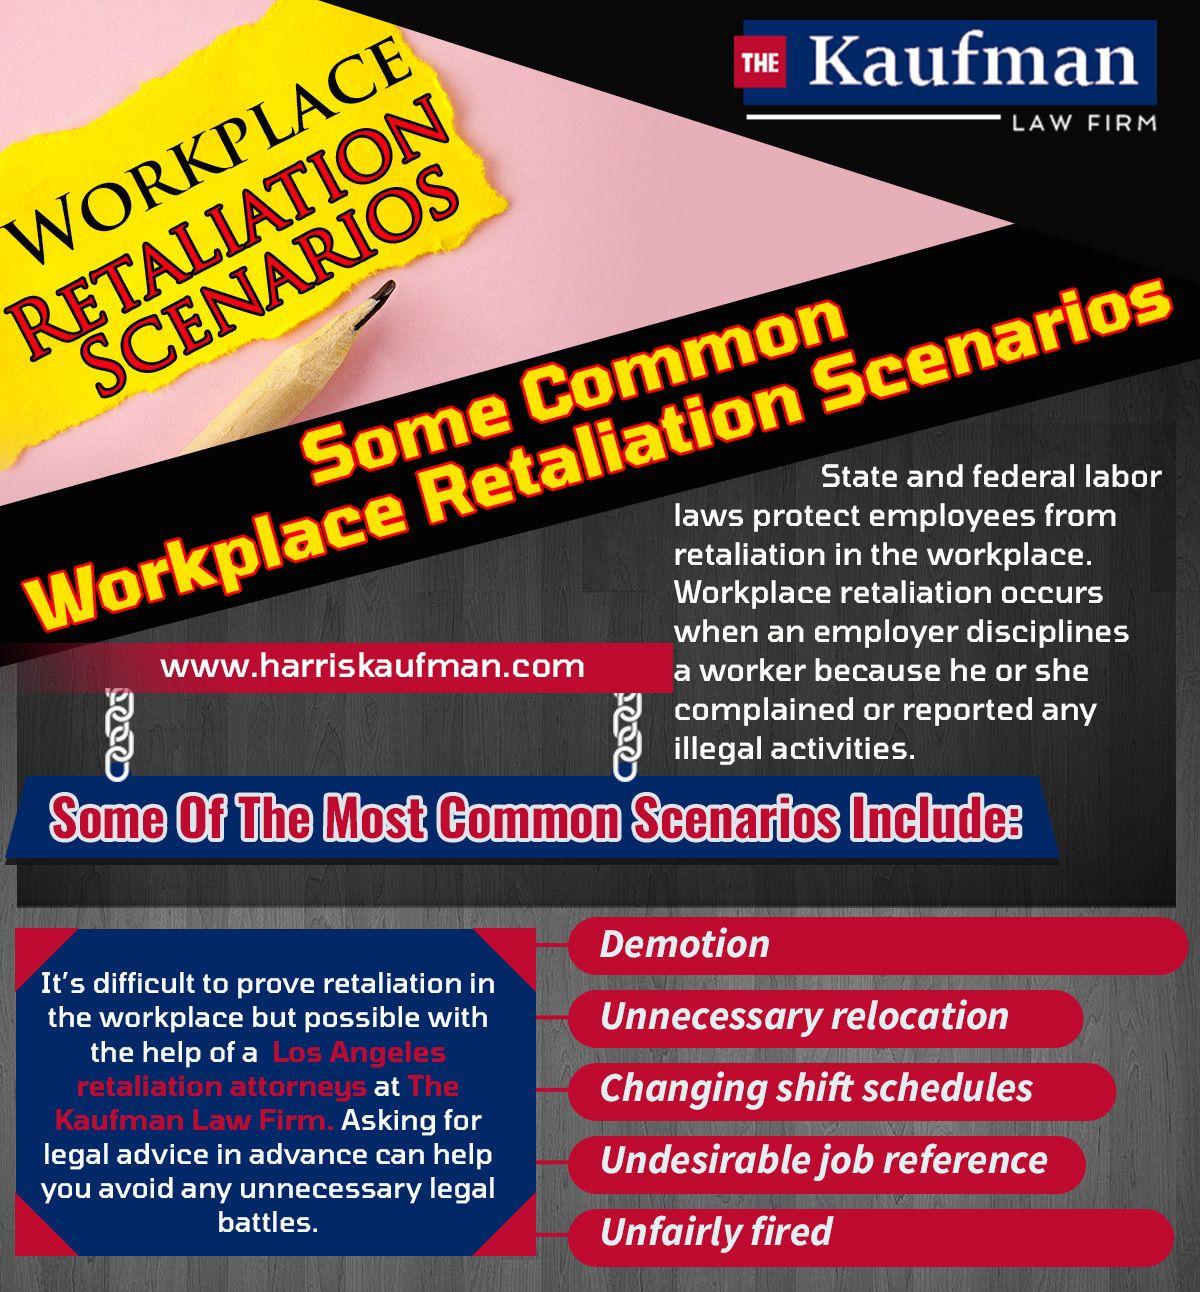 Los Angeles Retaliation Attorney Workplace Retaliation Lawyer Workplace Employment Law Occupational Health And Safety